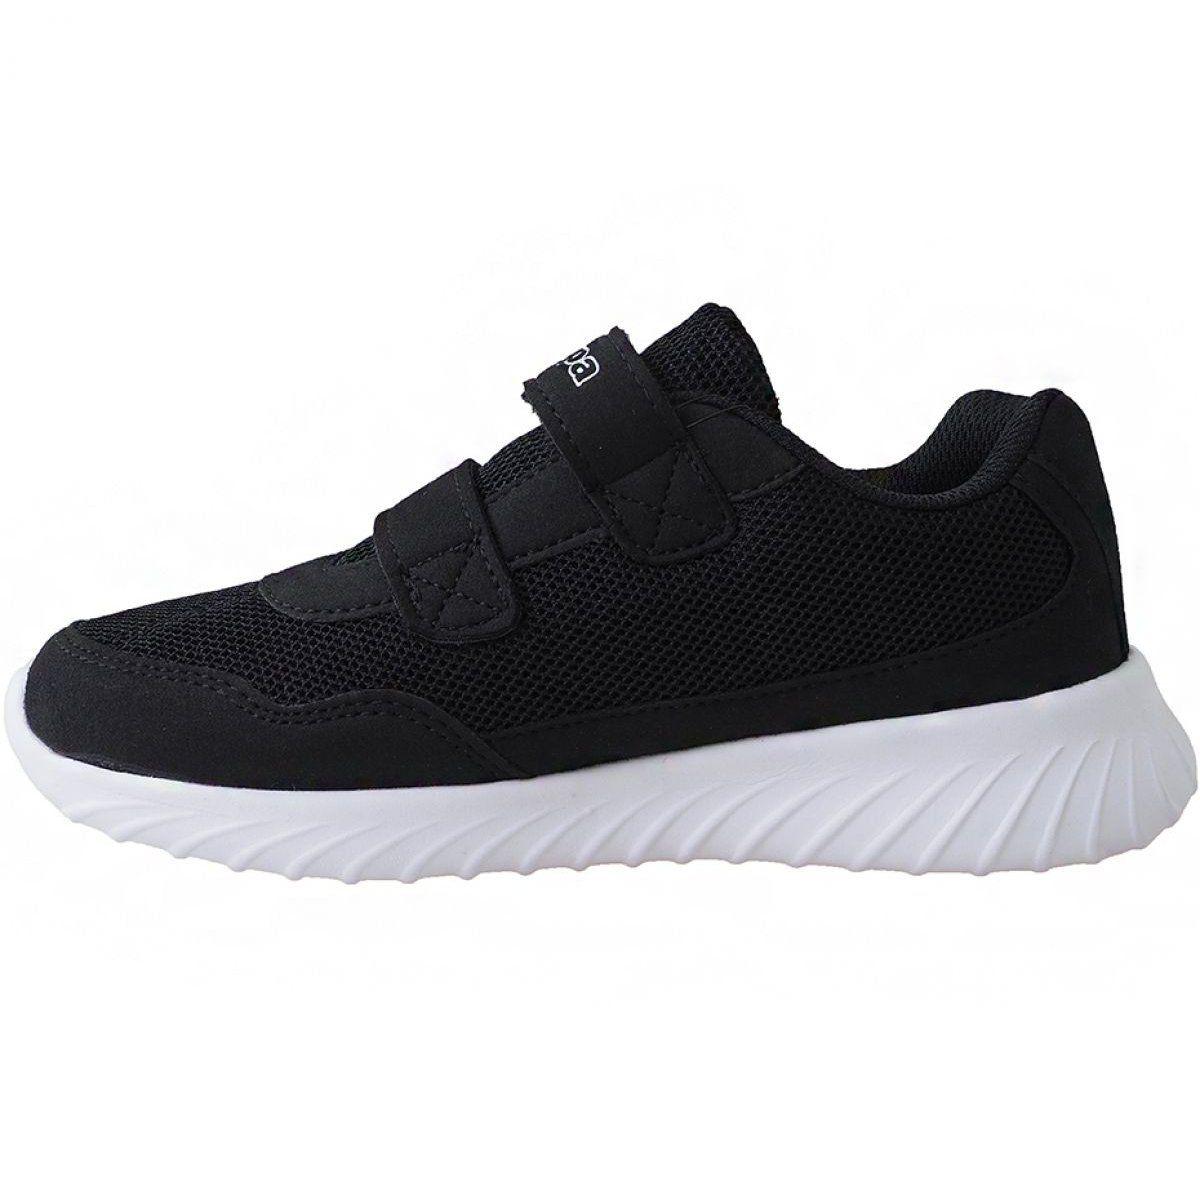 Buty Kappa Cracker Ii Jr 260647k 1110 Czarne Black Shoes Kid Shoes Shoes